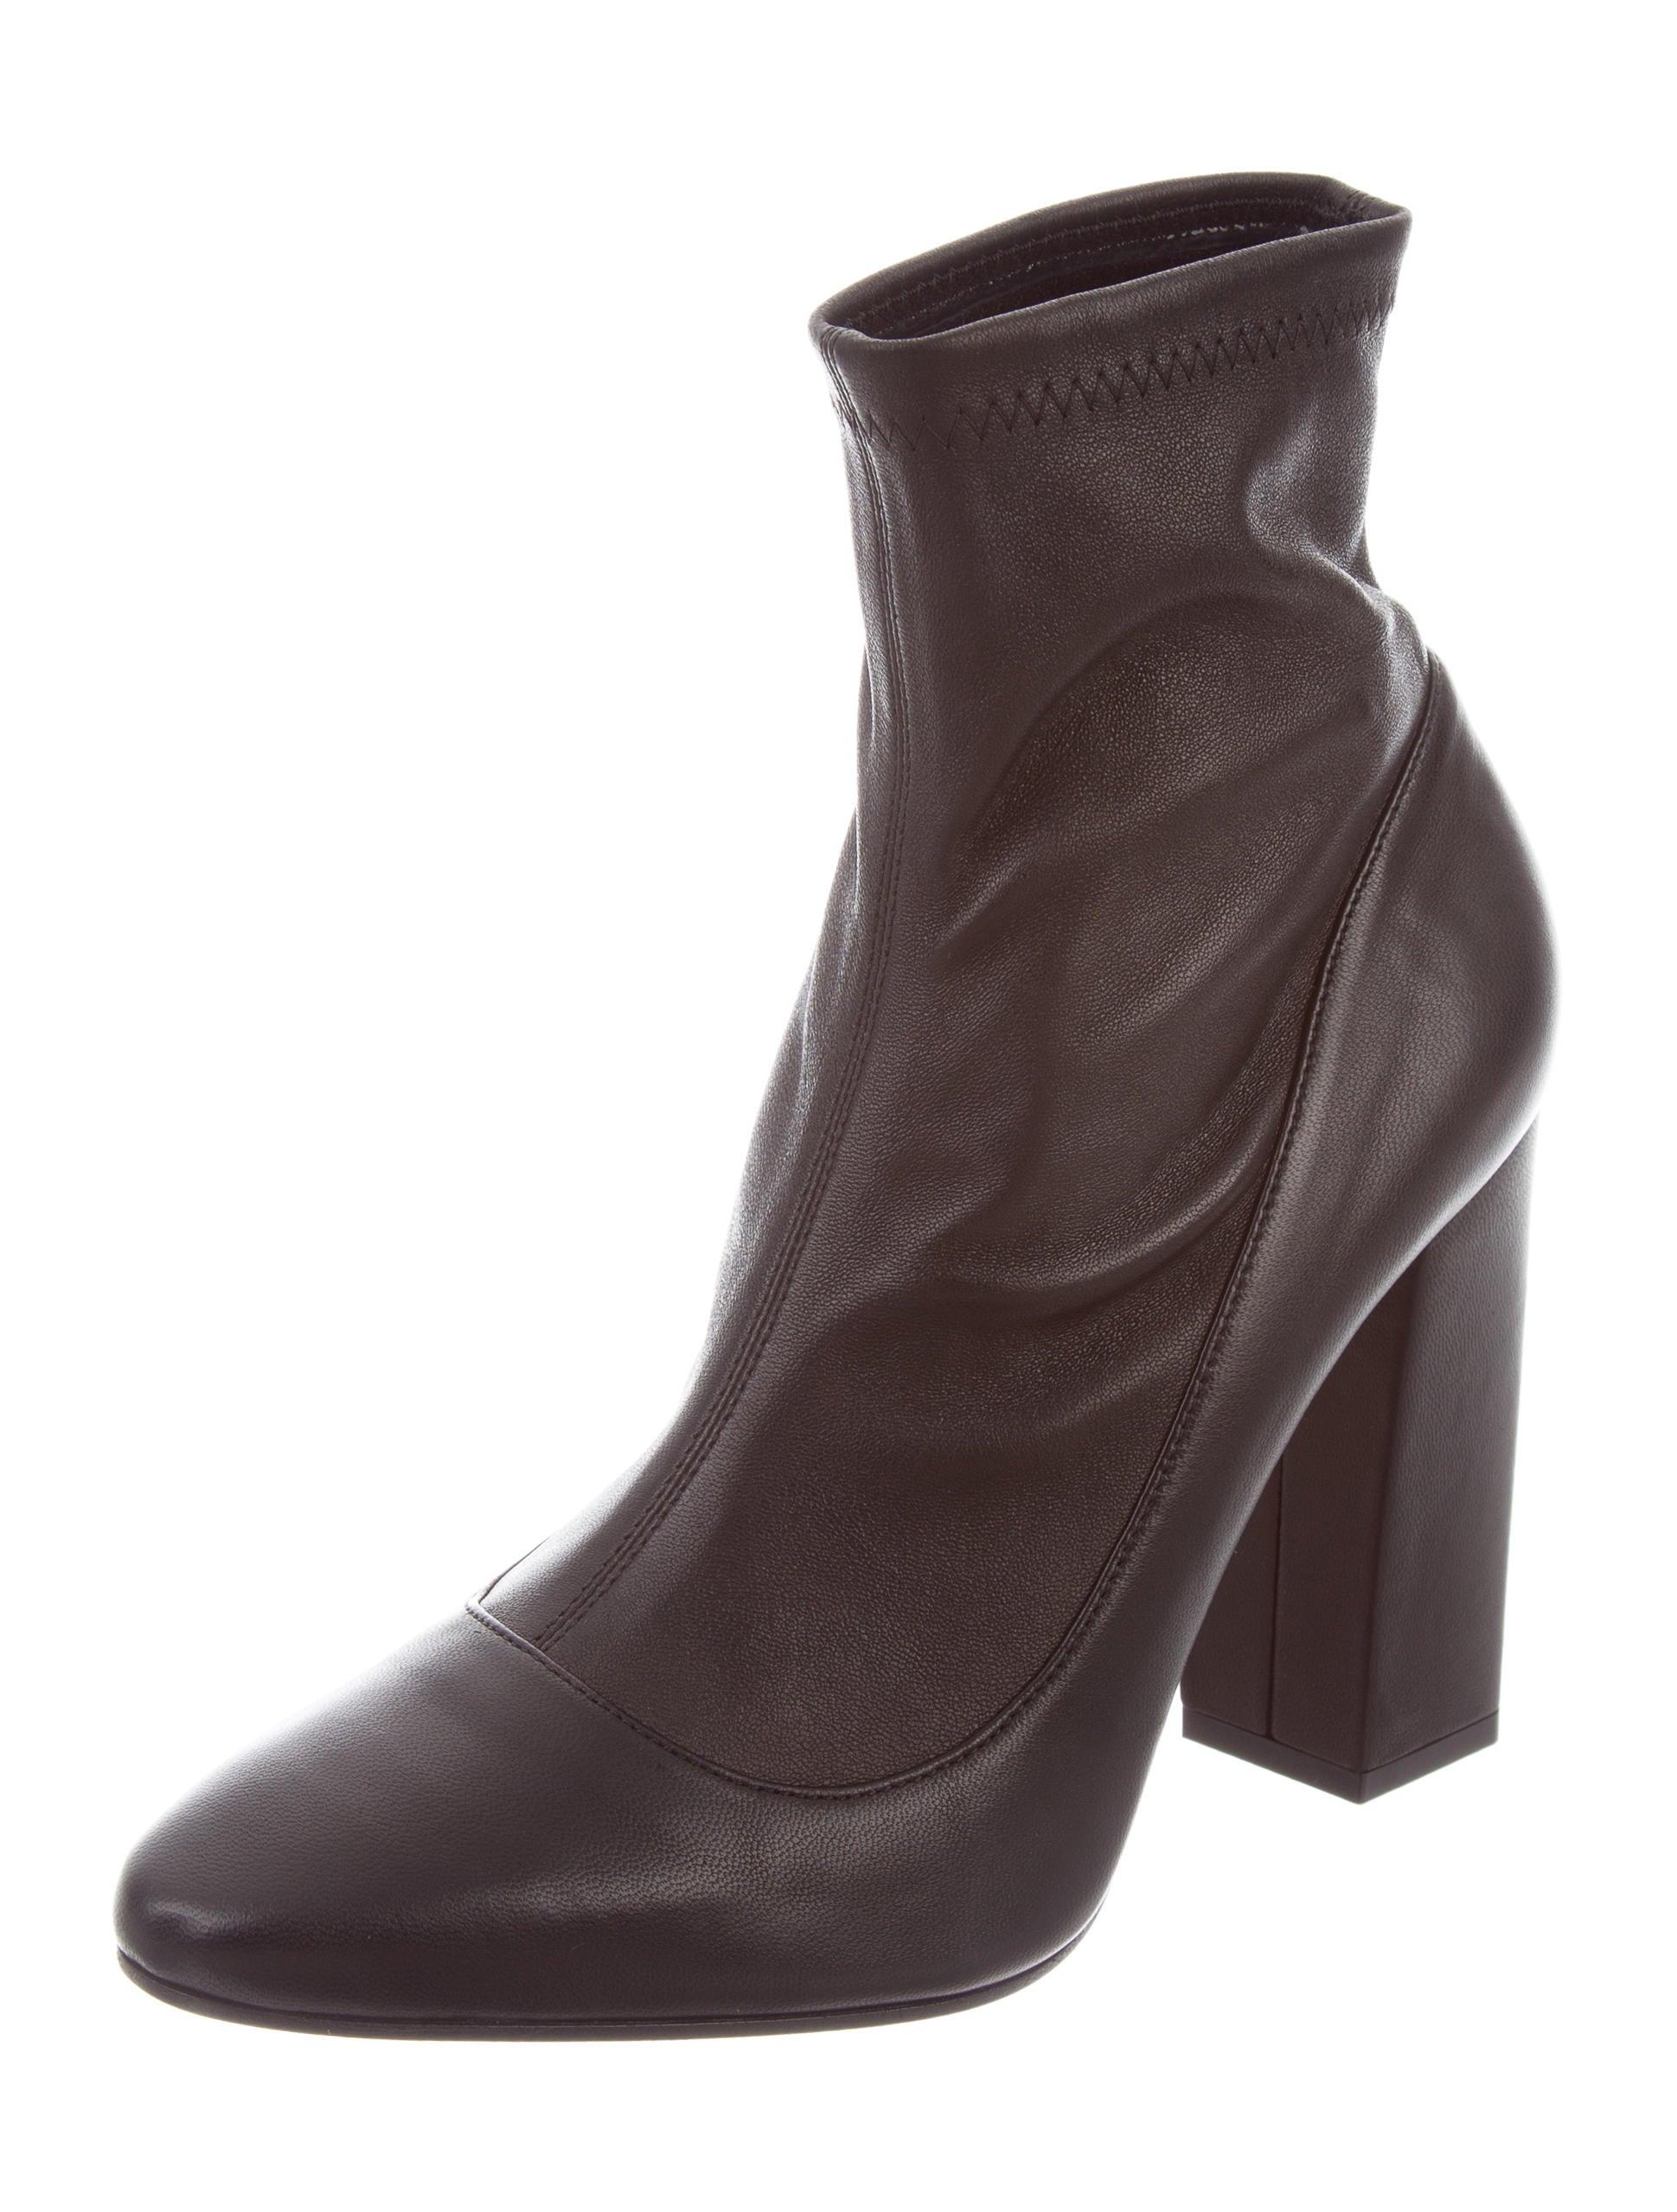 Tamara Mellon Leather Round-Toe Ankle Boots new sale online 64E0xMxo